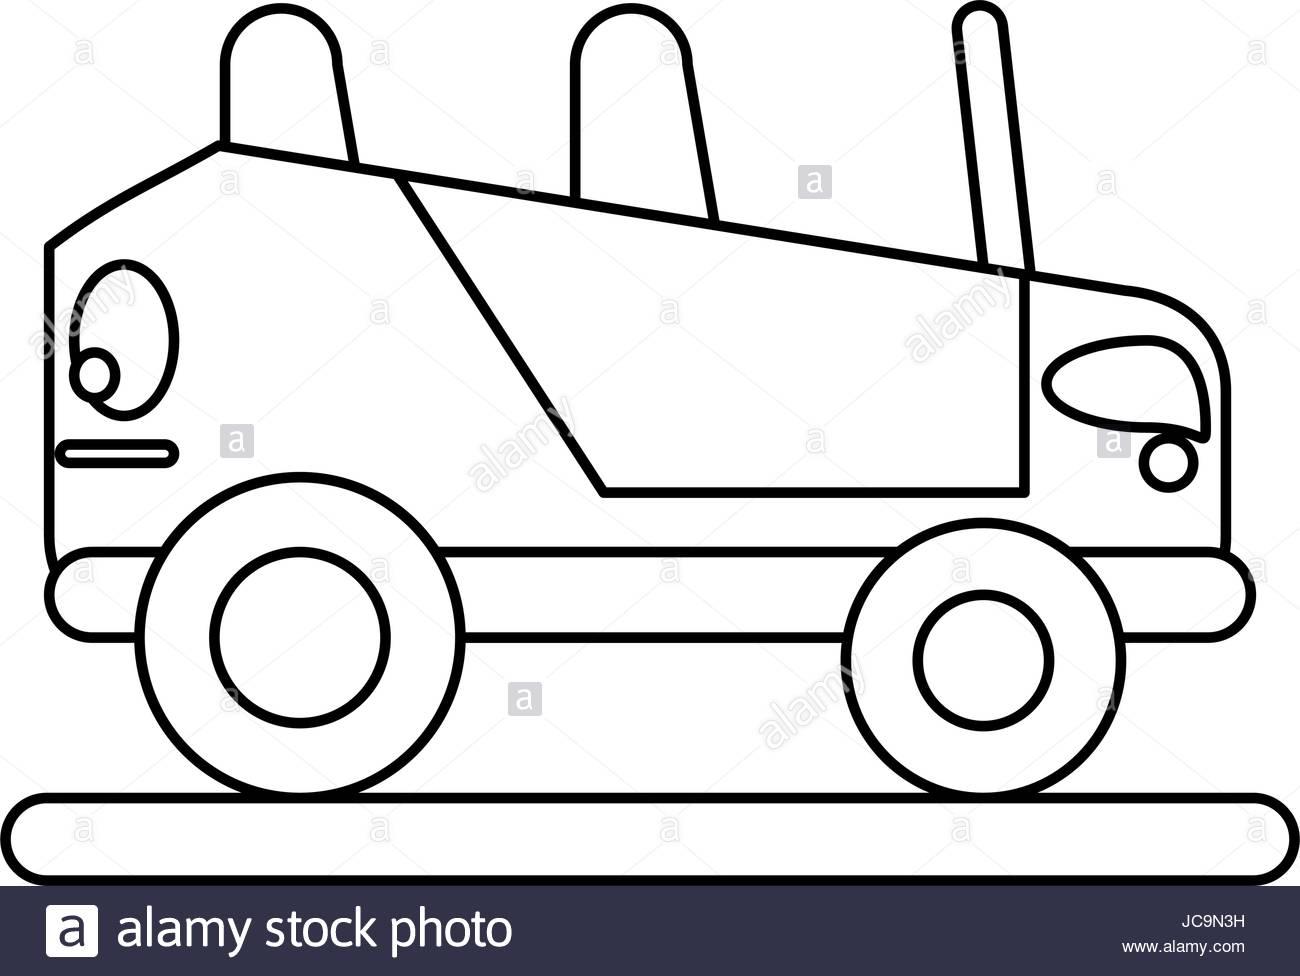 1300x976 Convertible Car Icon Image Stock Vector Art Amp Illustration, Vector